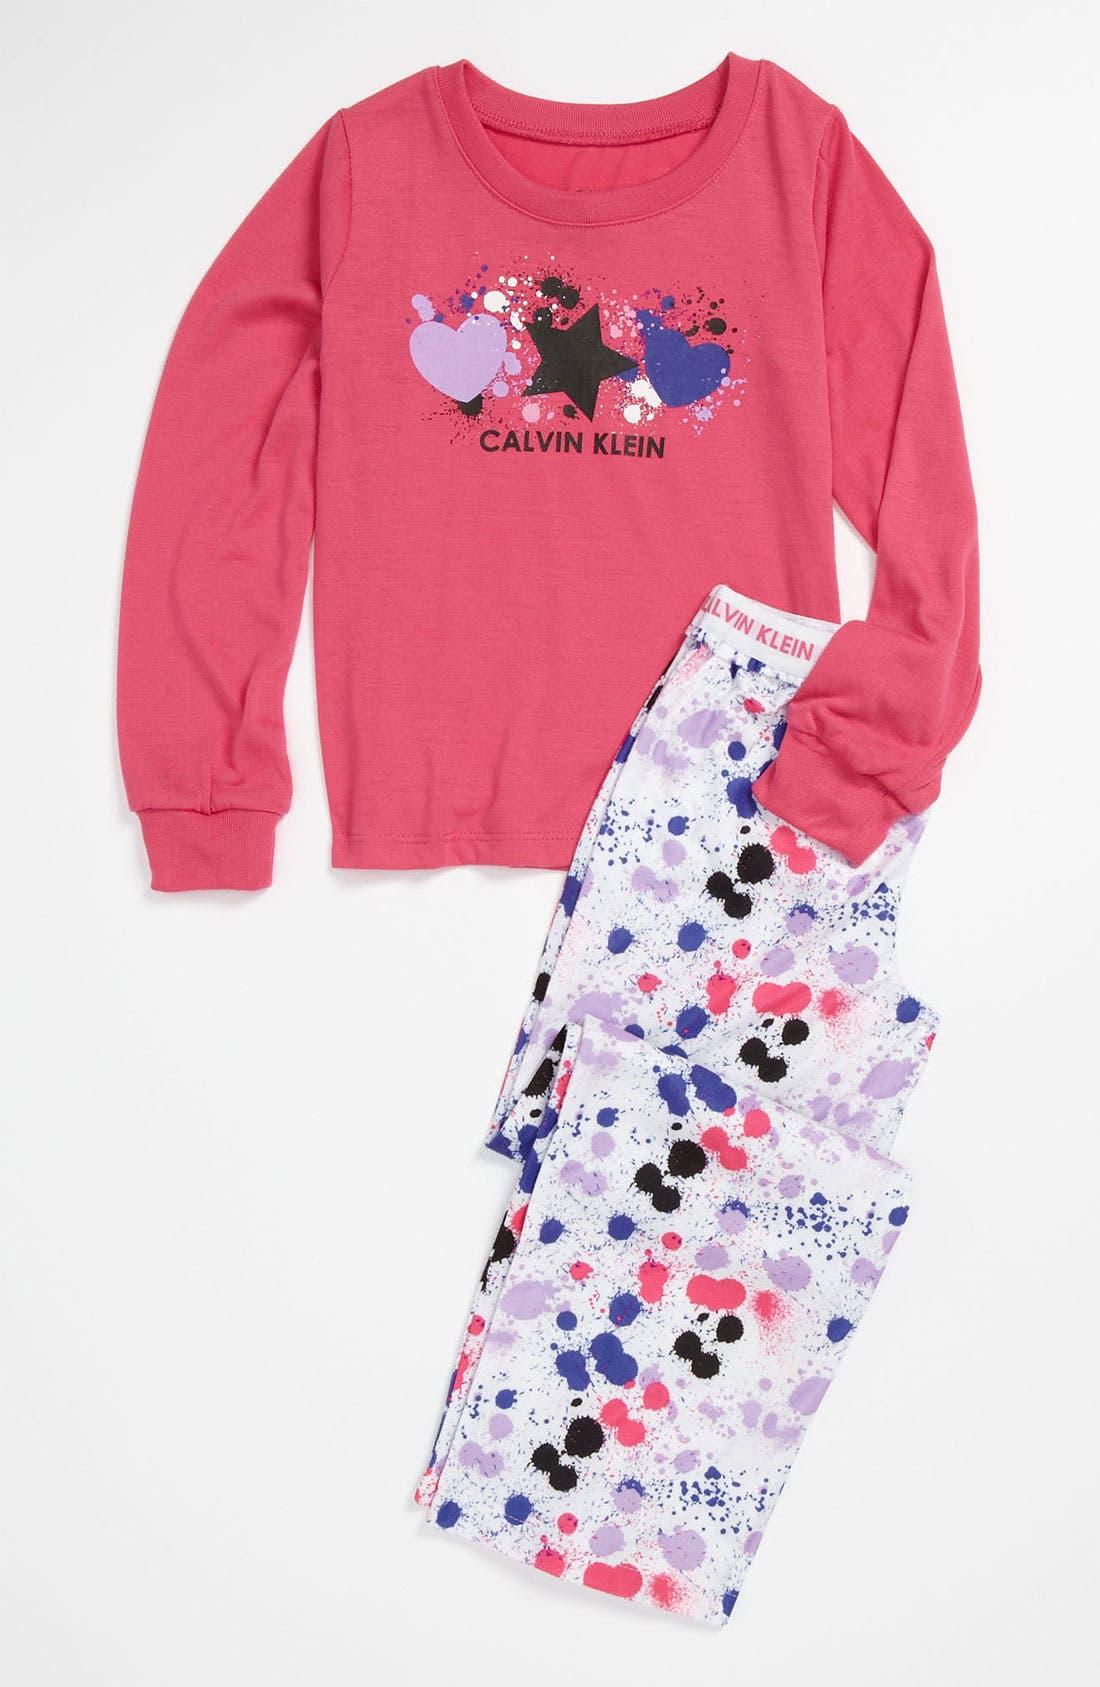 Alternate Image 1 Selected - Calvin Klein Knit Top & Pants Set (Little Girls & Big Girls)